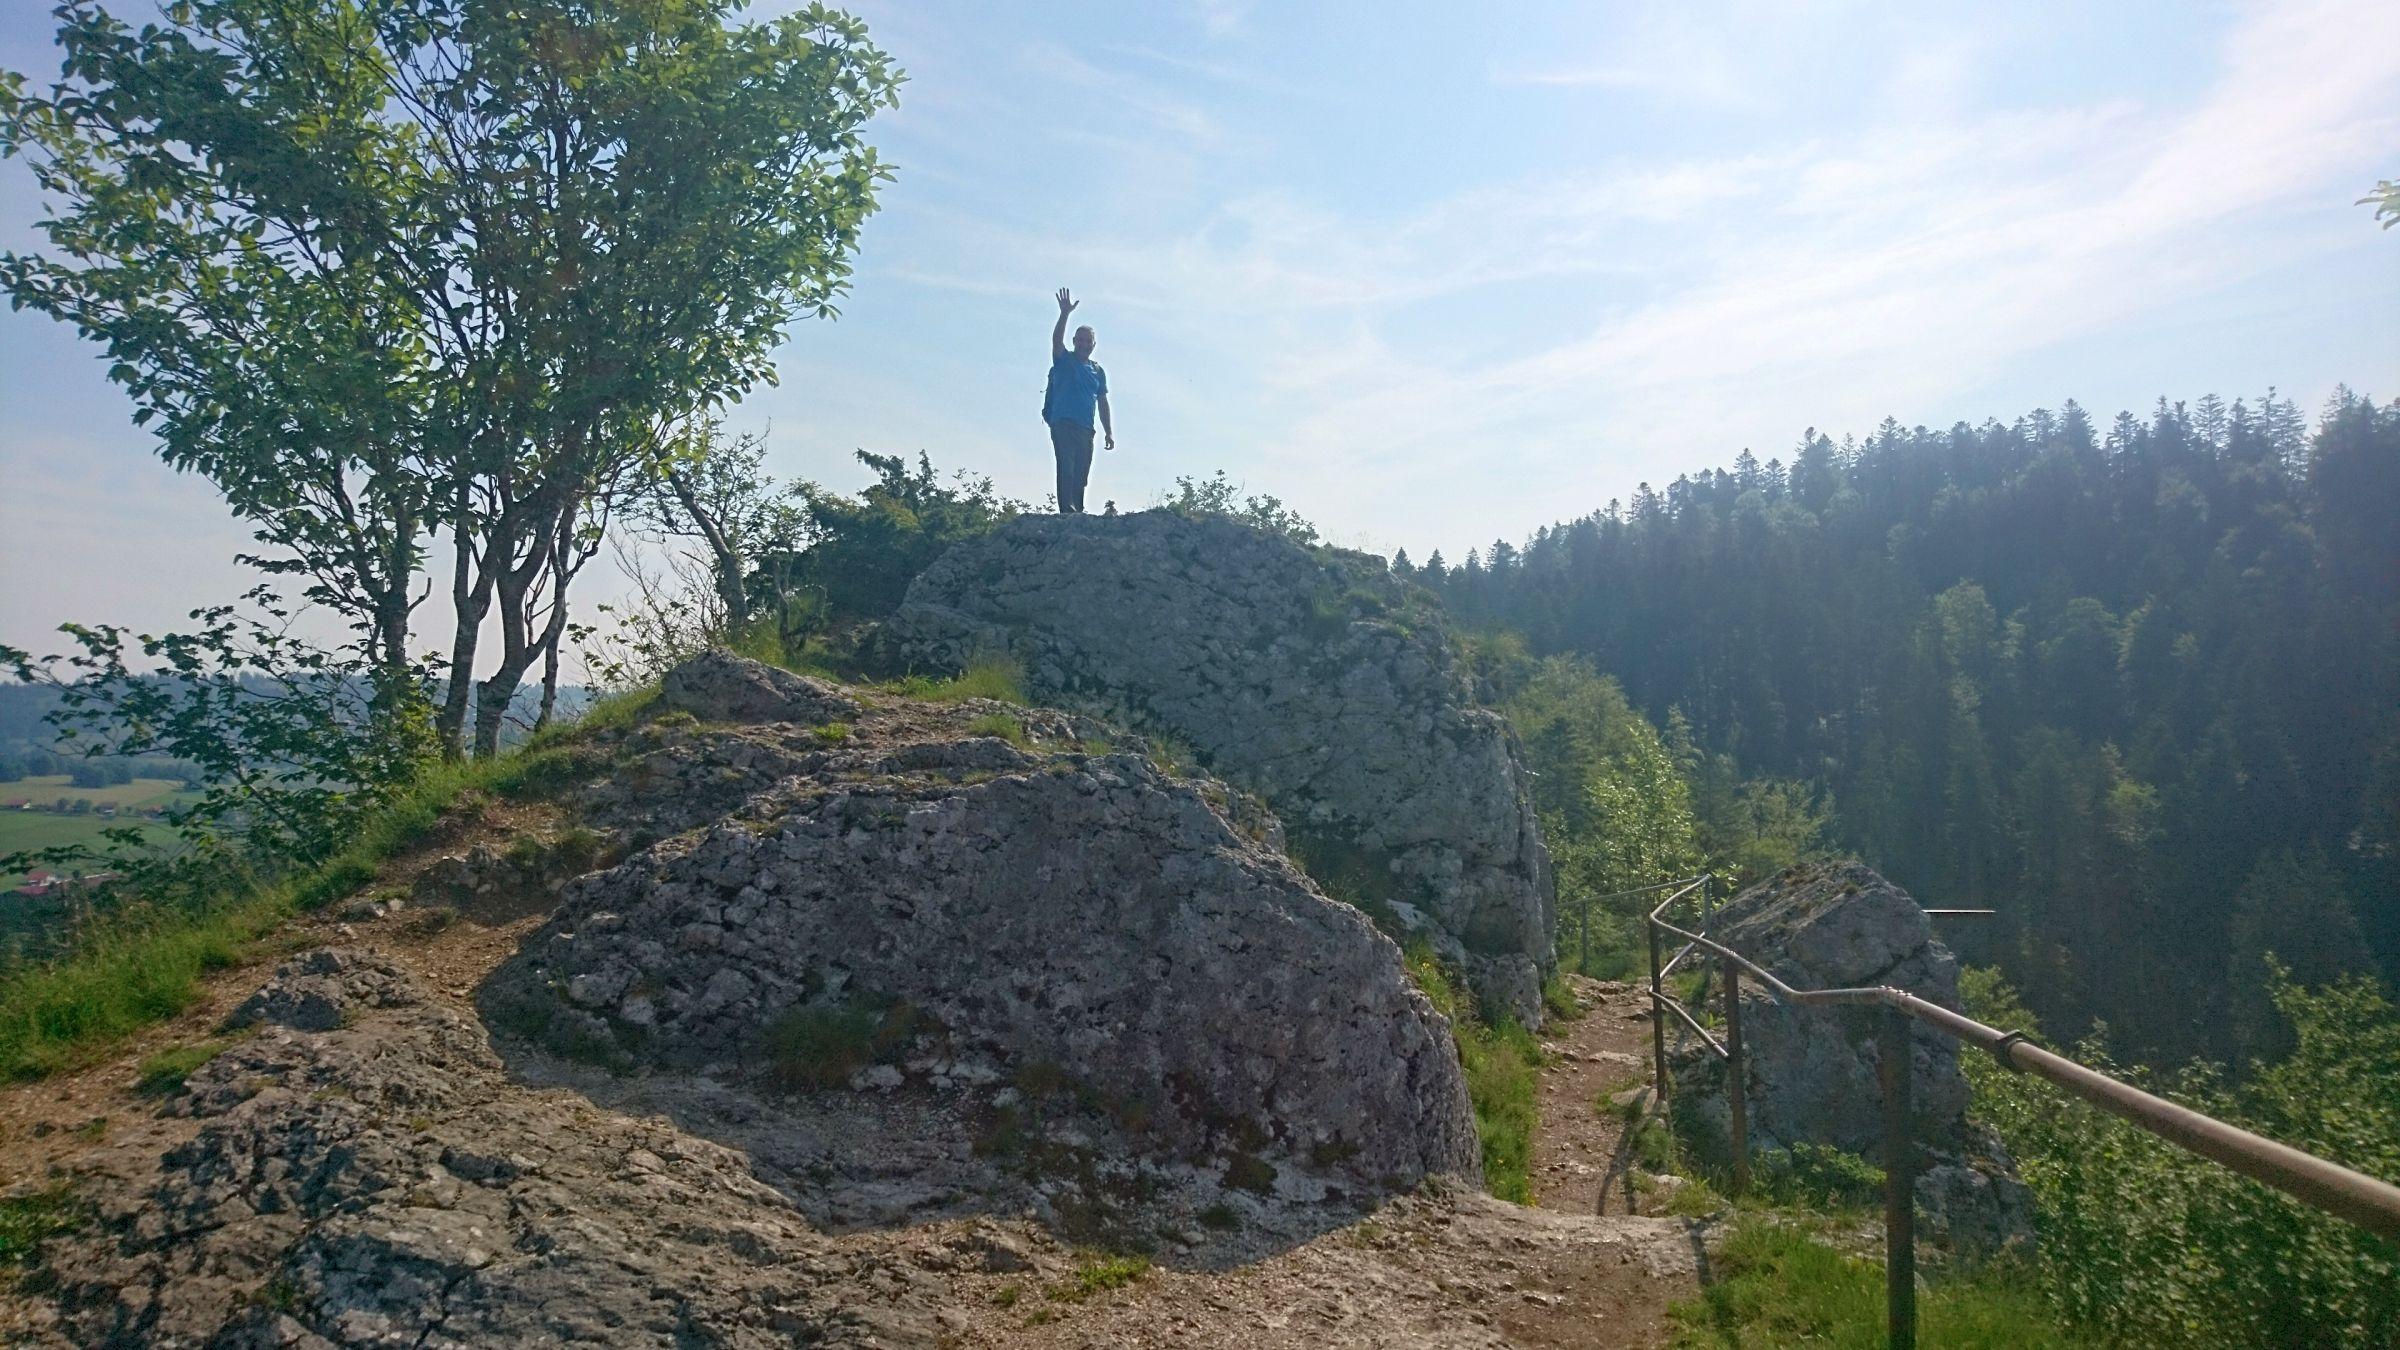 Wanderung Arête des Sommêtres 12.06.2021